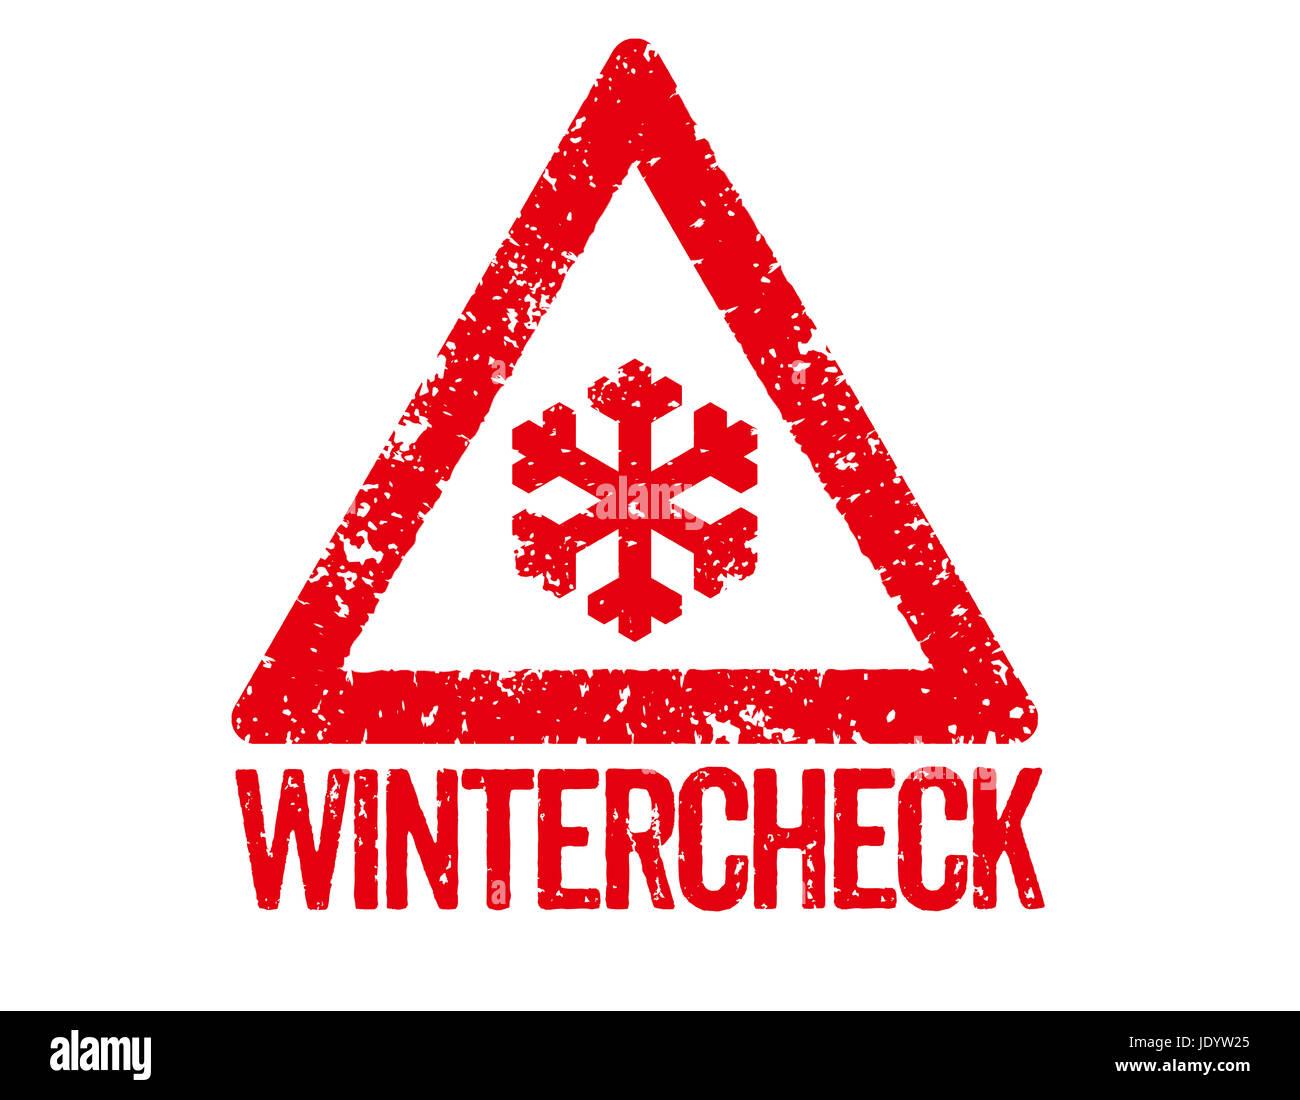 Roter Stempel - Wintercheck Stock Photo